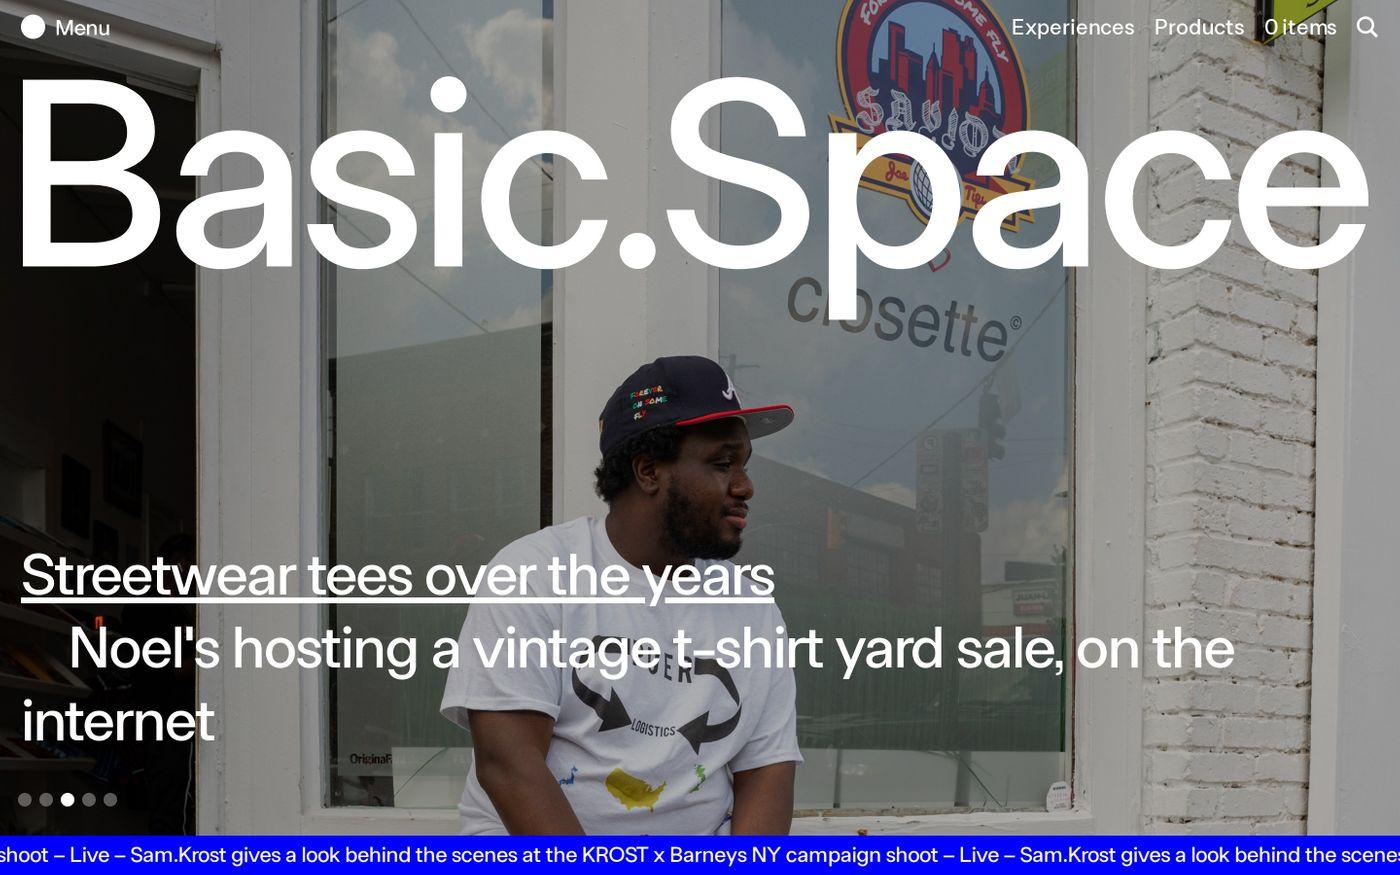 Screenshot of Basic.Space website